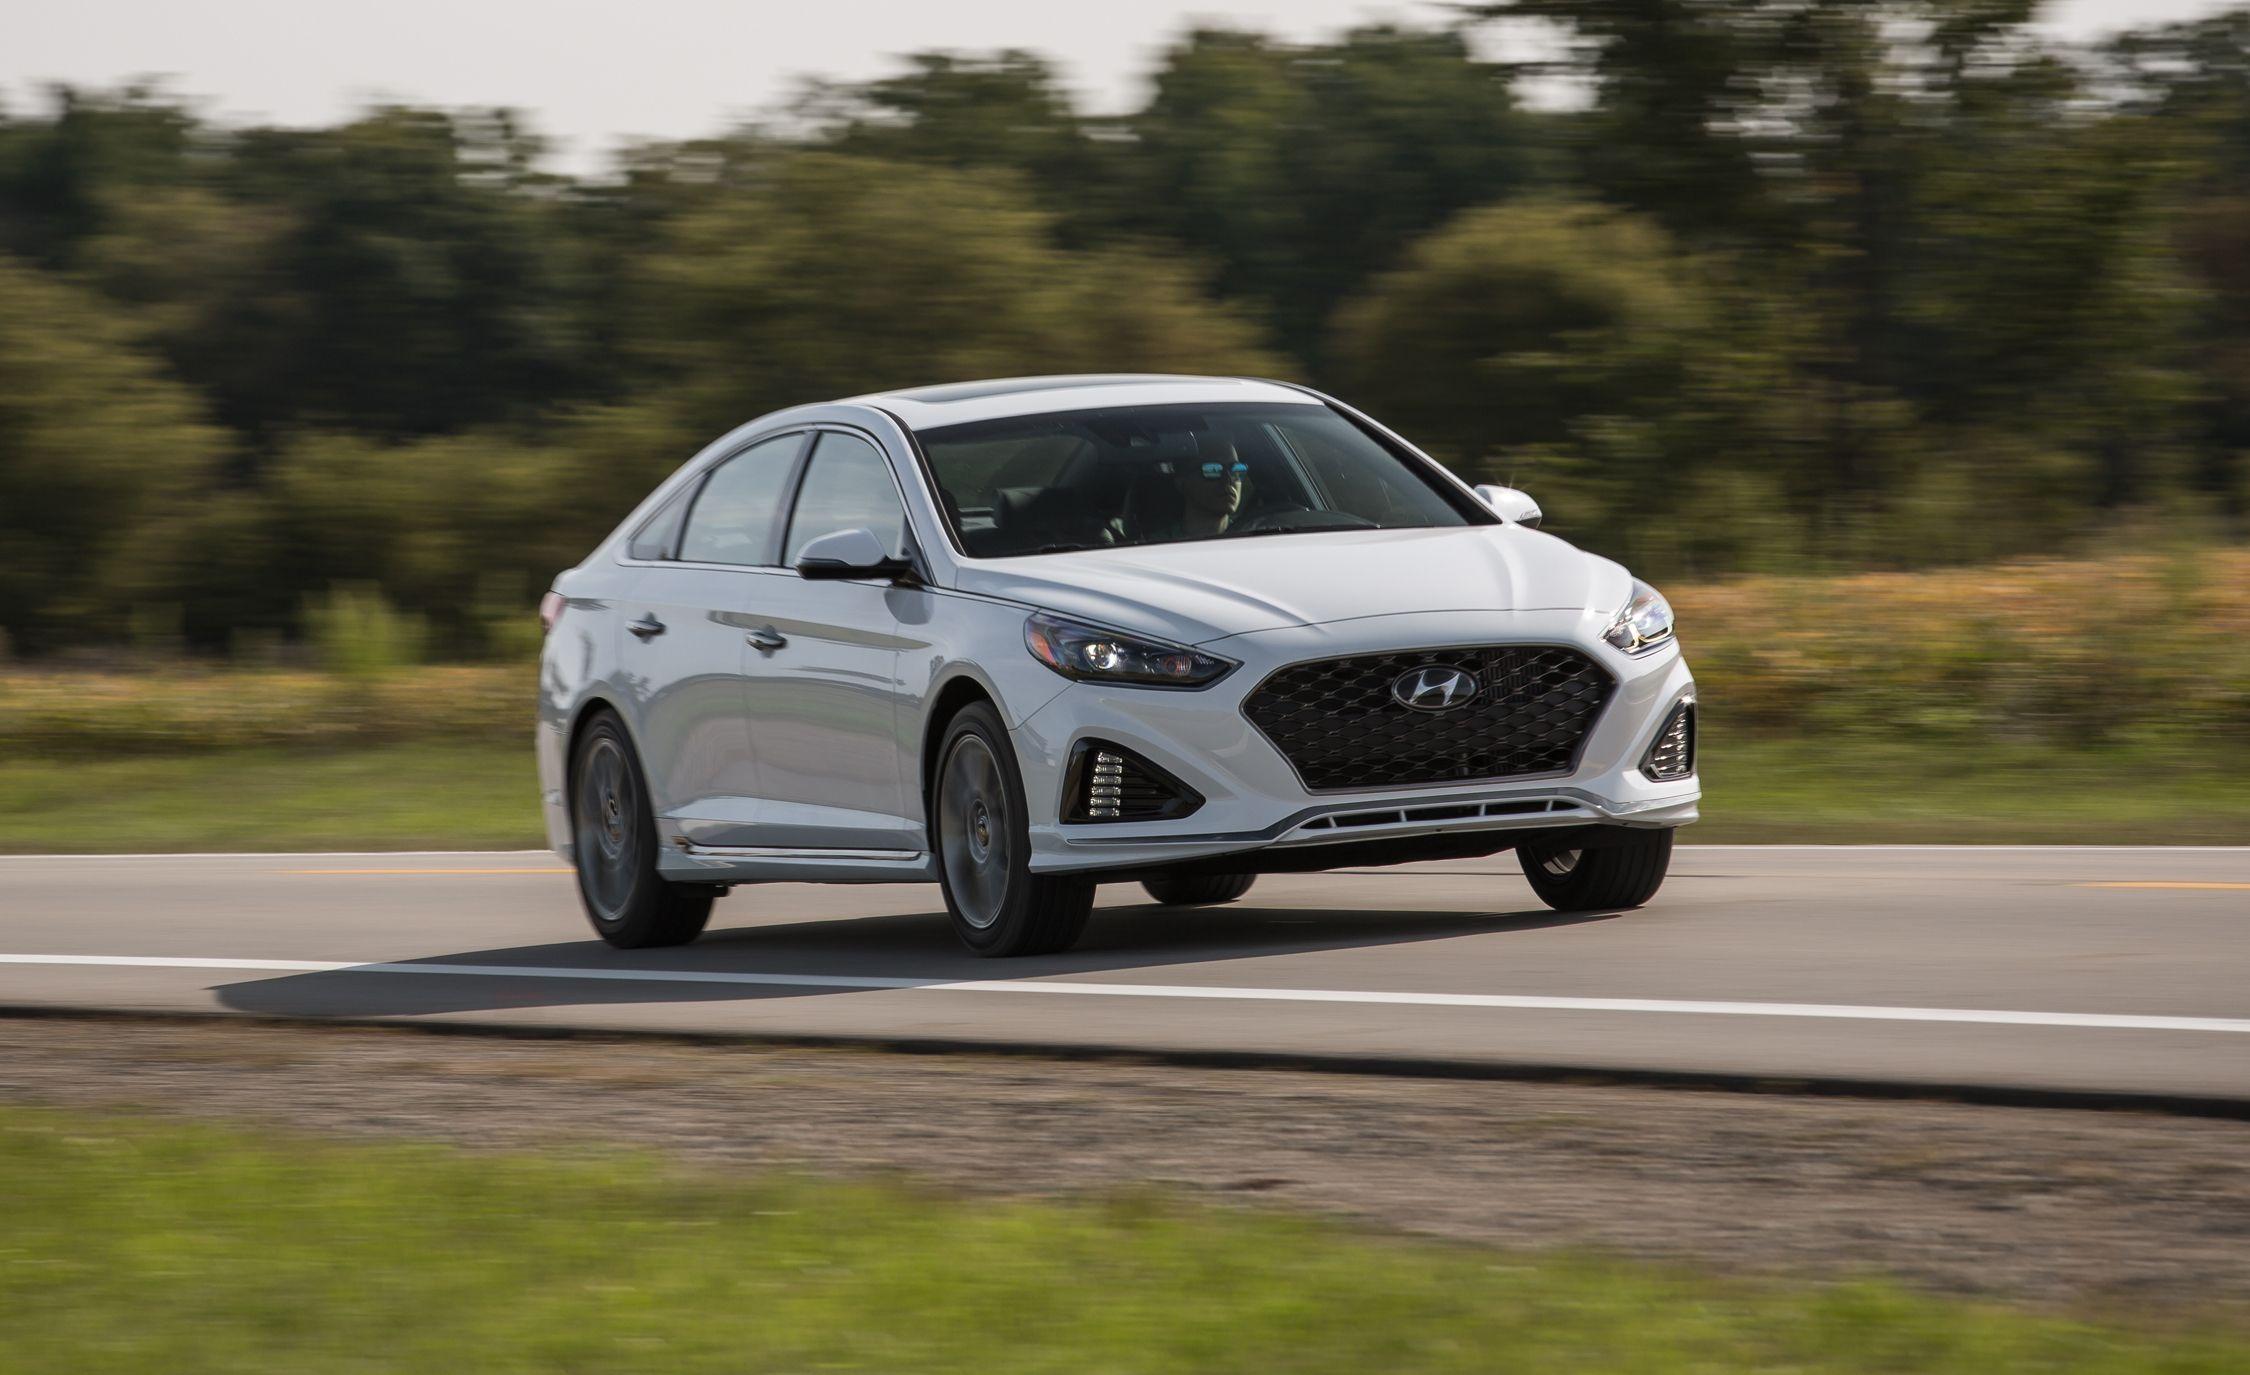 2018 Hyundai Sonata 2 0T Test | Review | Car and Driver